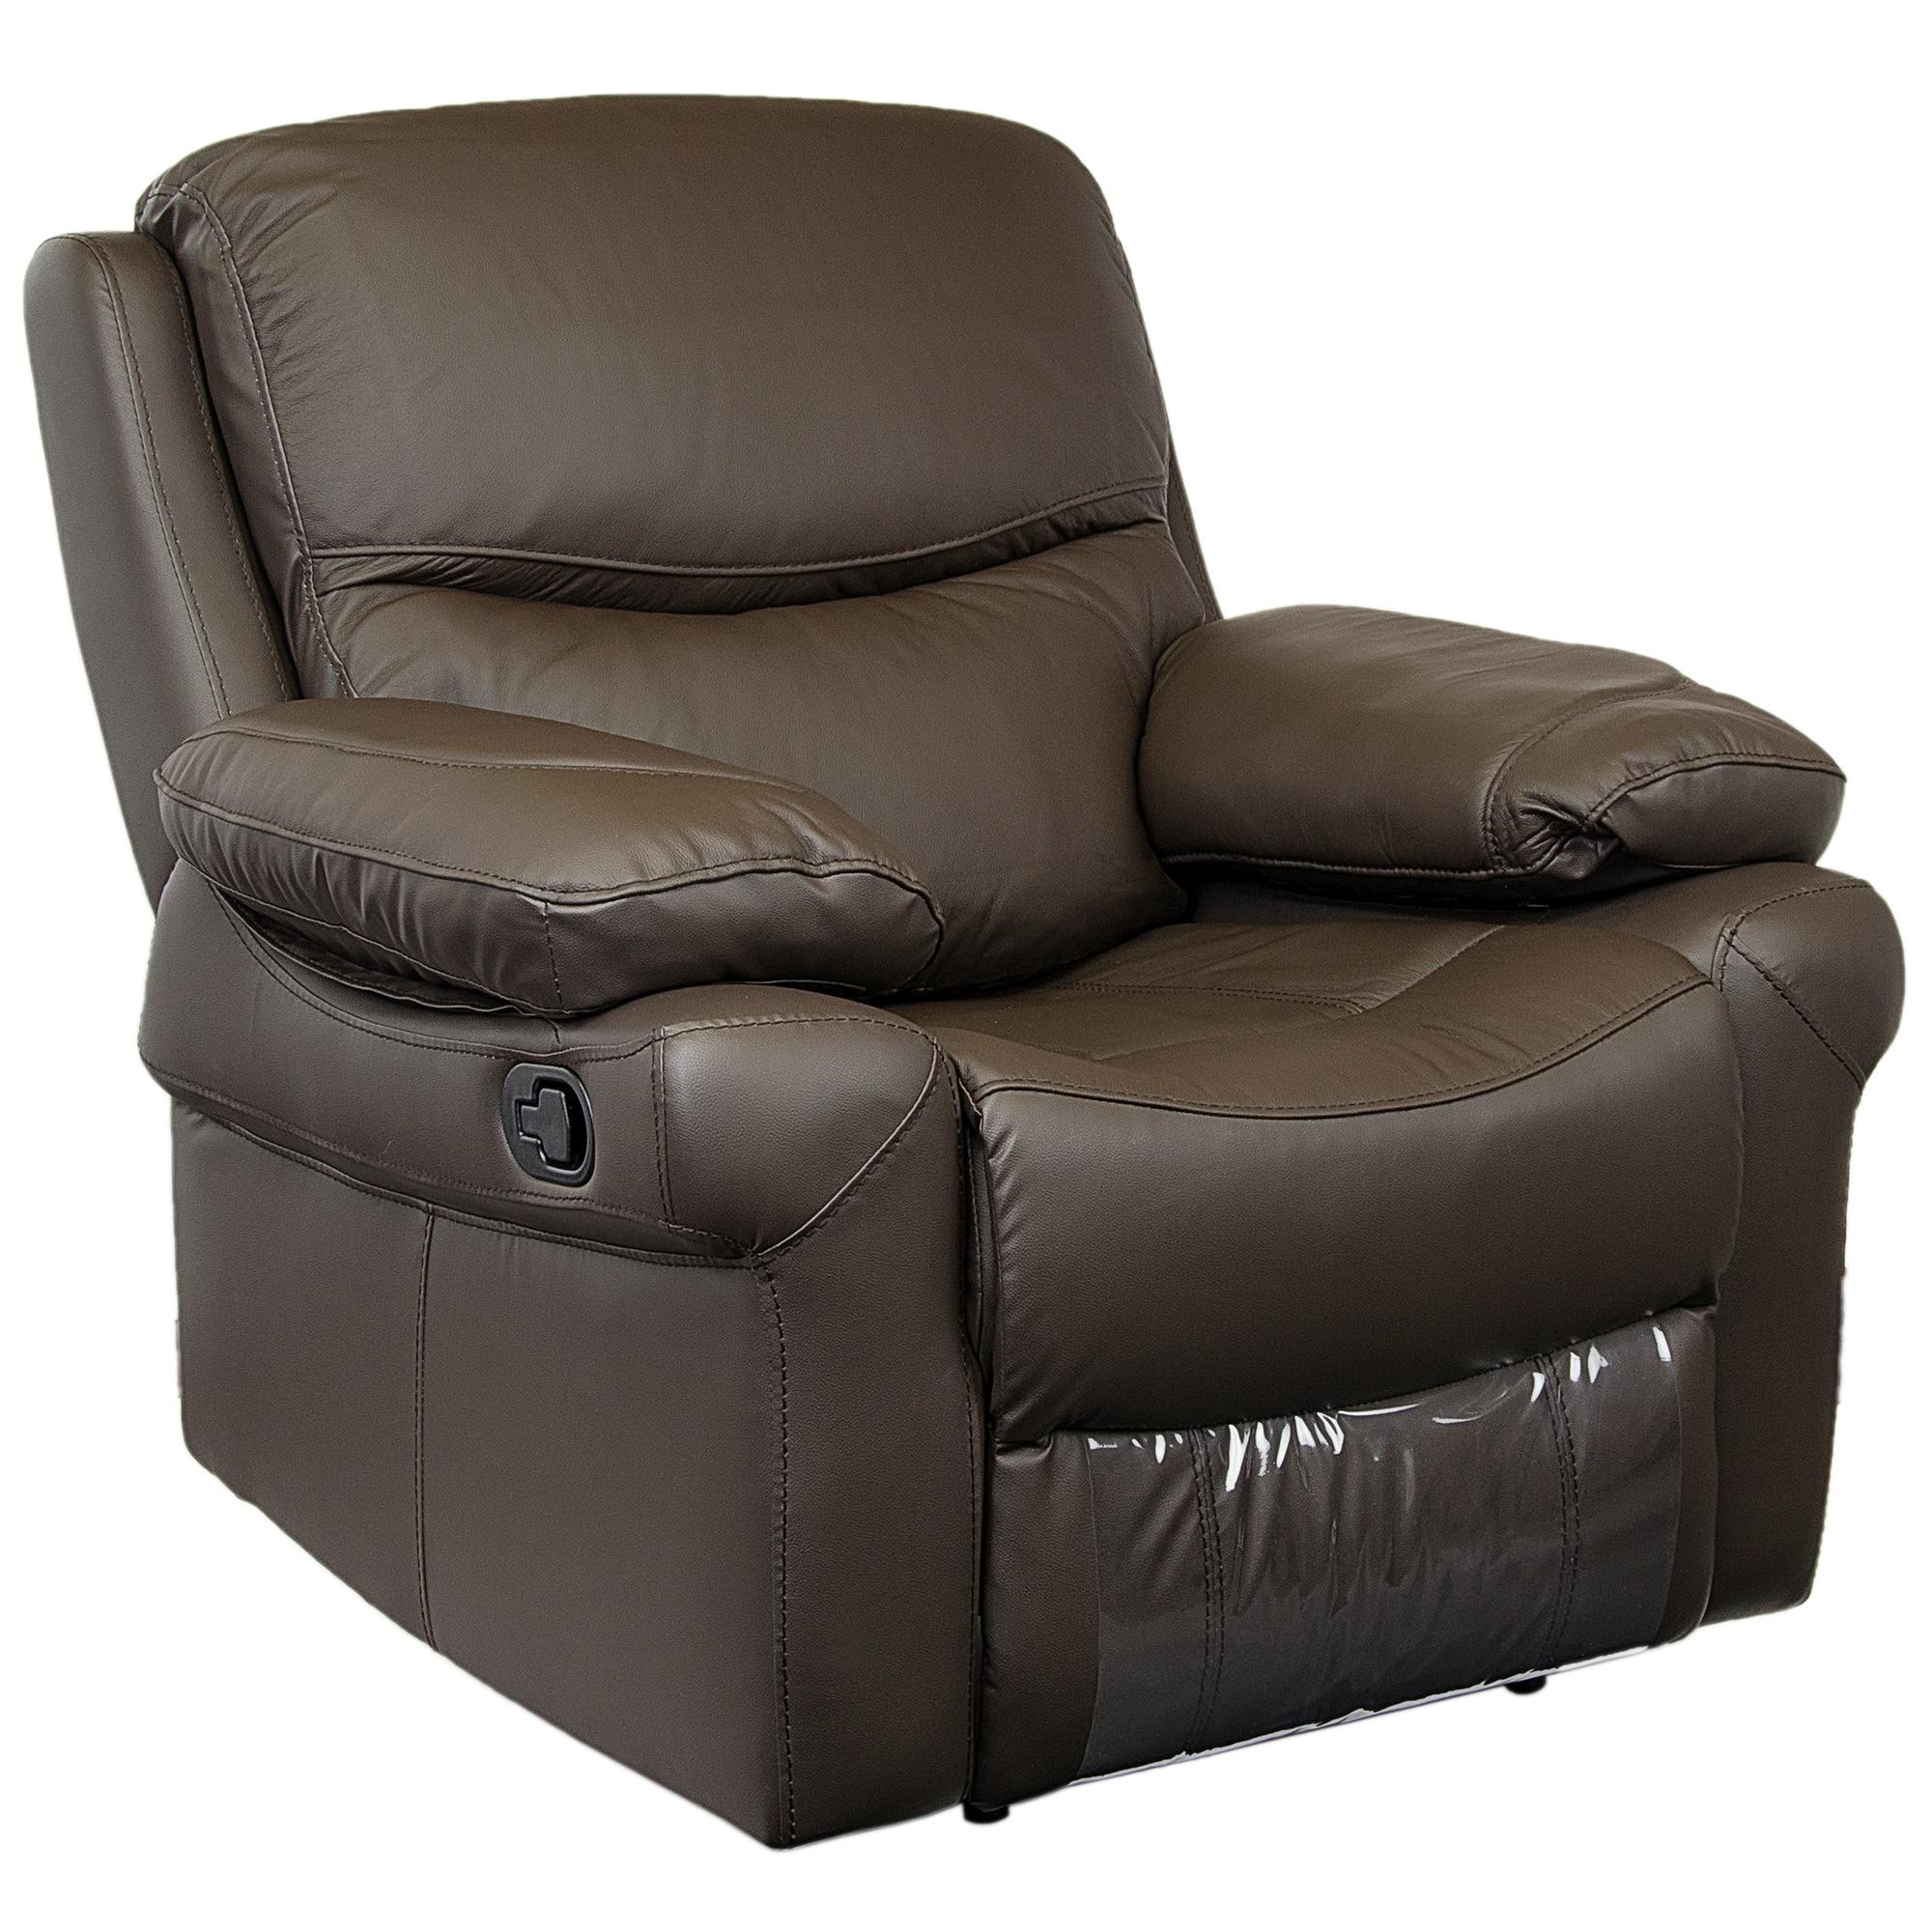 Fotografie Fotoliu Kring Royal, cu recliner si 3 trepte de confort, piele naturala, Maro, 107 x 98 x 100 cm